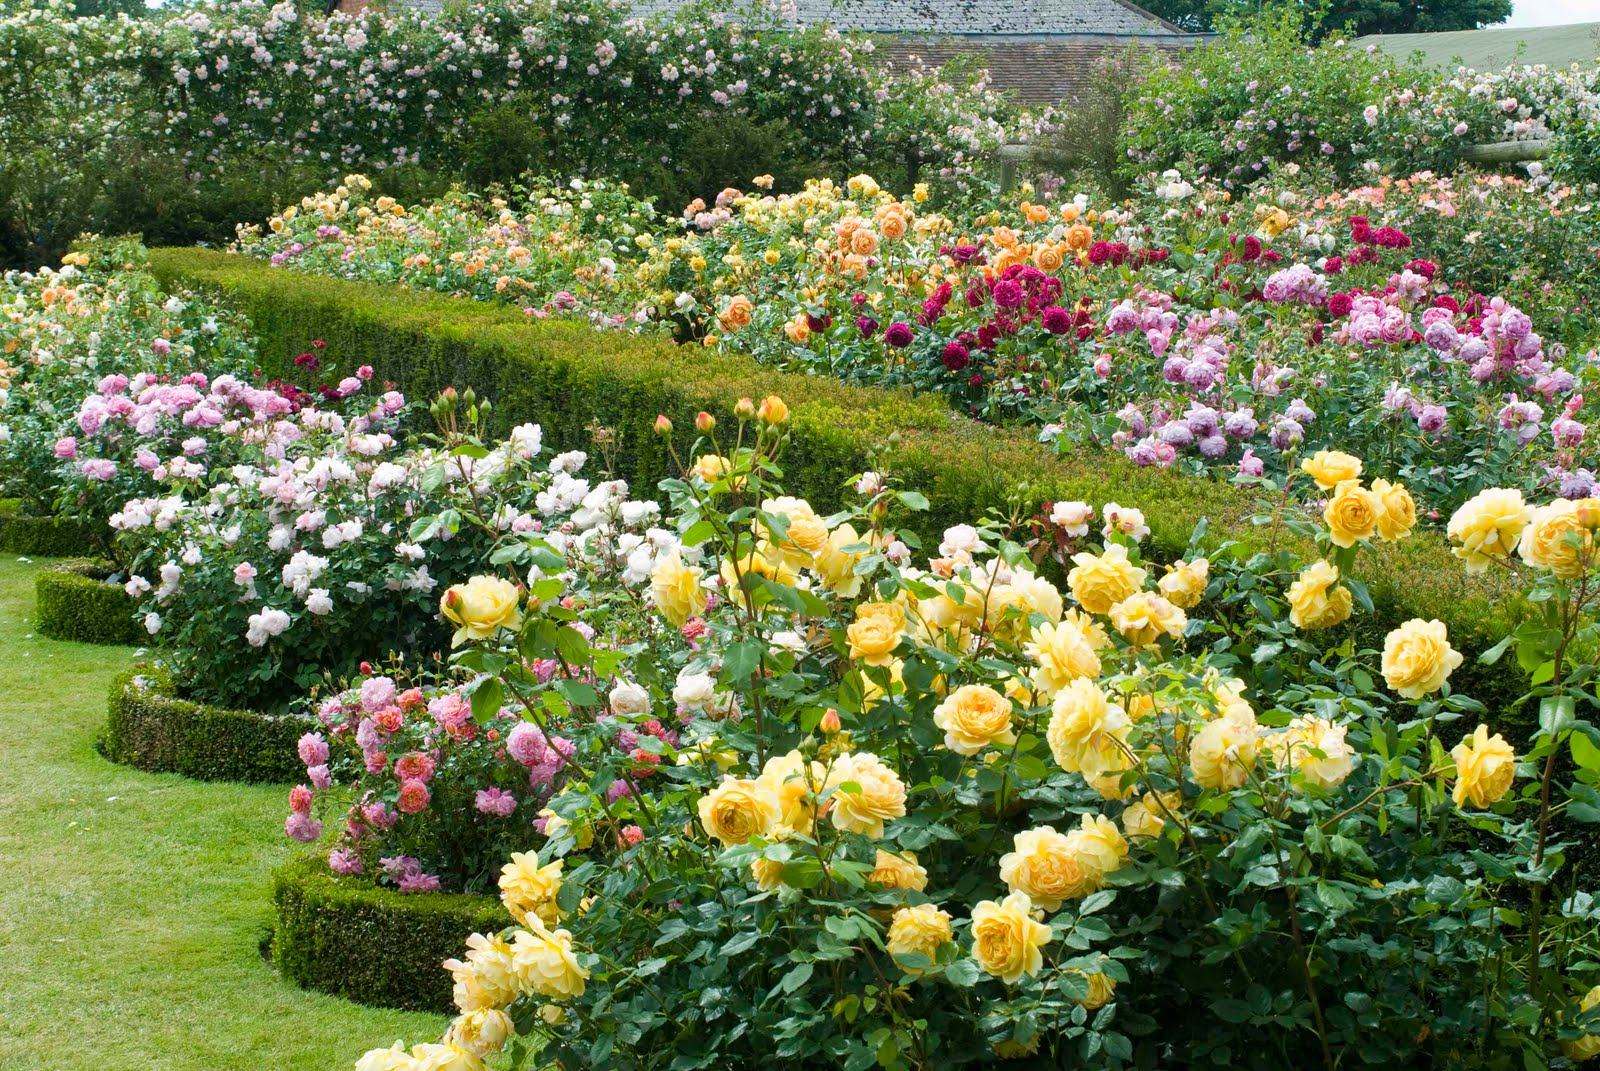 david austin roses new introductions chelsea flower show david austin rose gardens